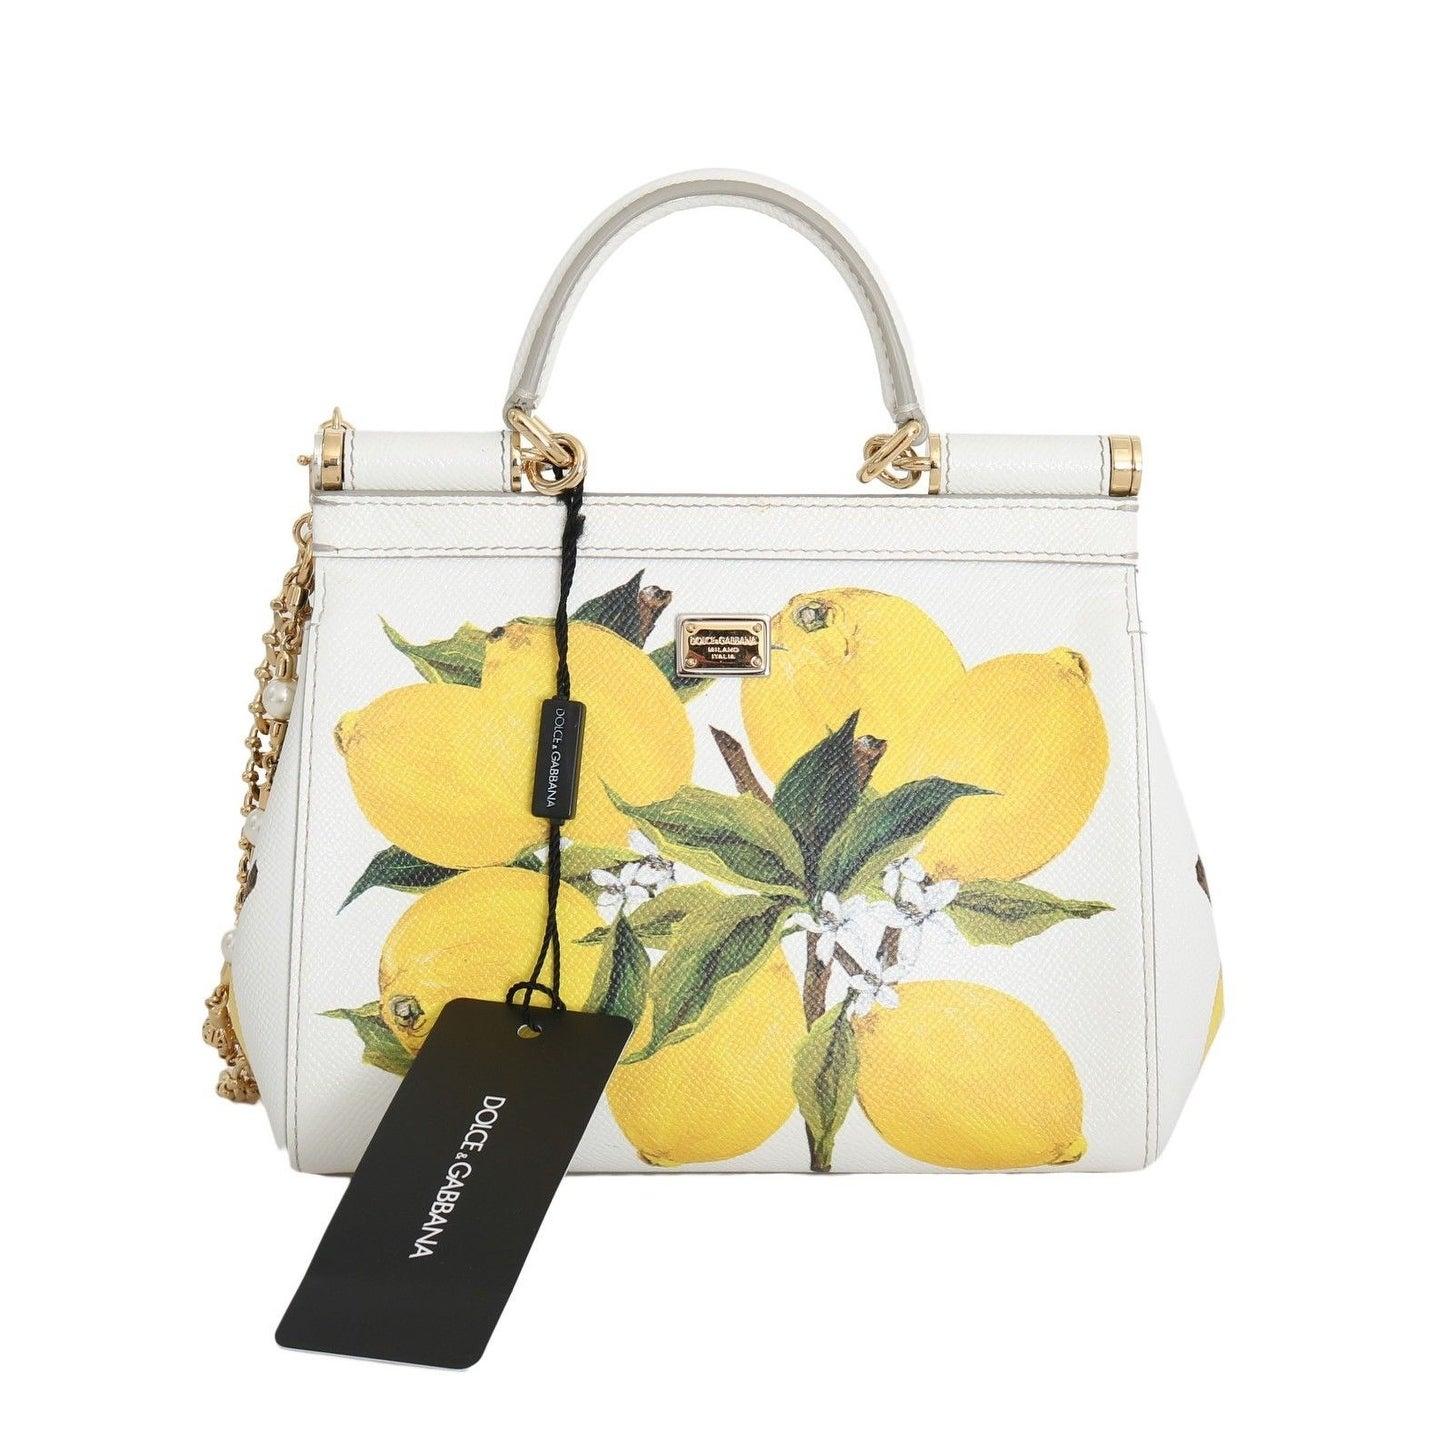 441740e646 Shop Dolce   Gabbana MISS SICILY Satchel White Lemon Print Leather Handbag  - Free Shipping Today - Overstock - 21178164